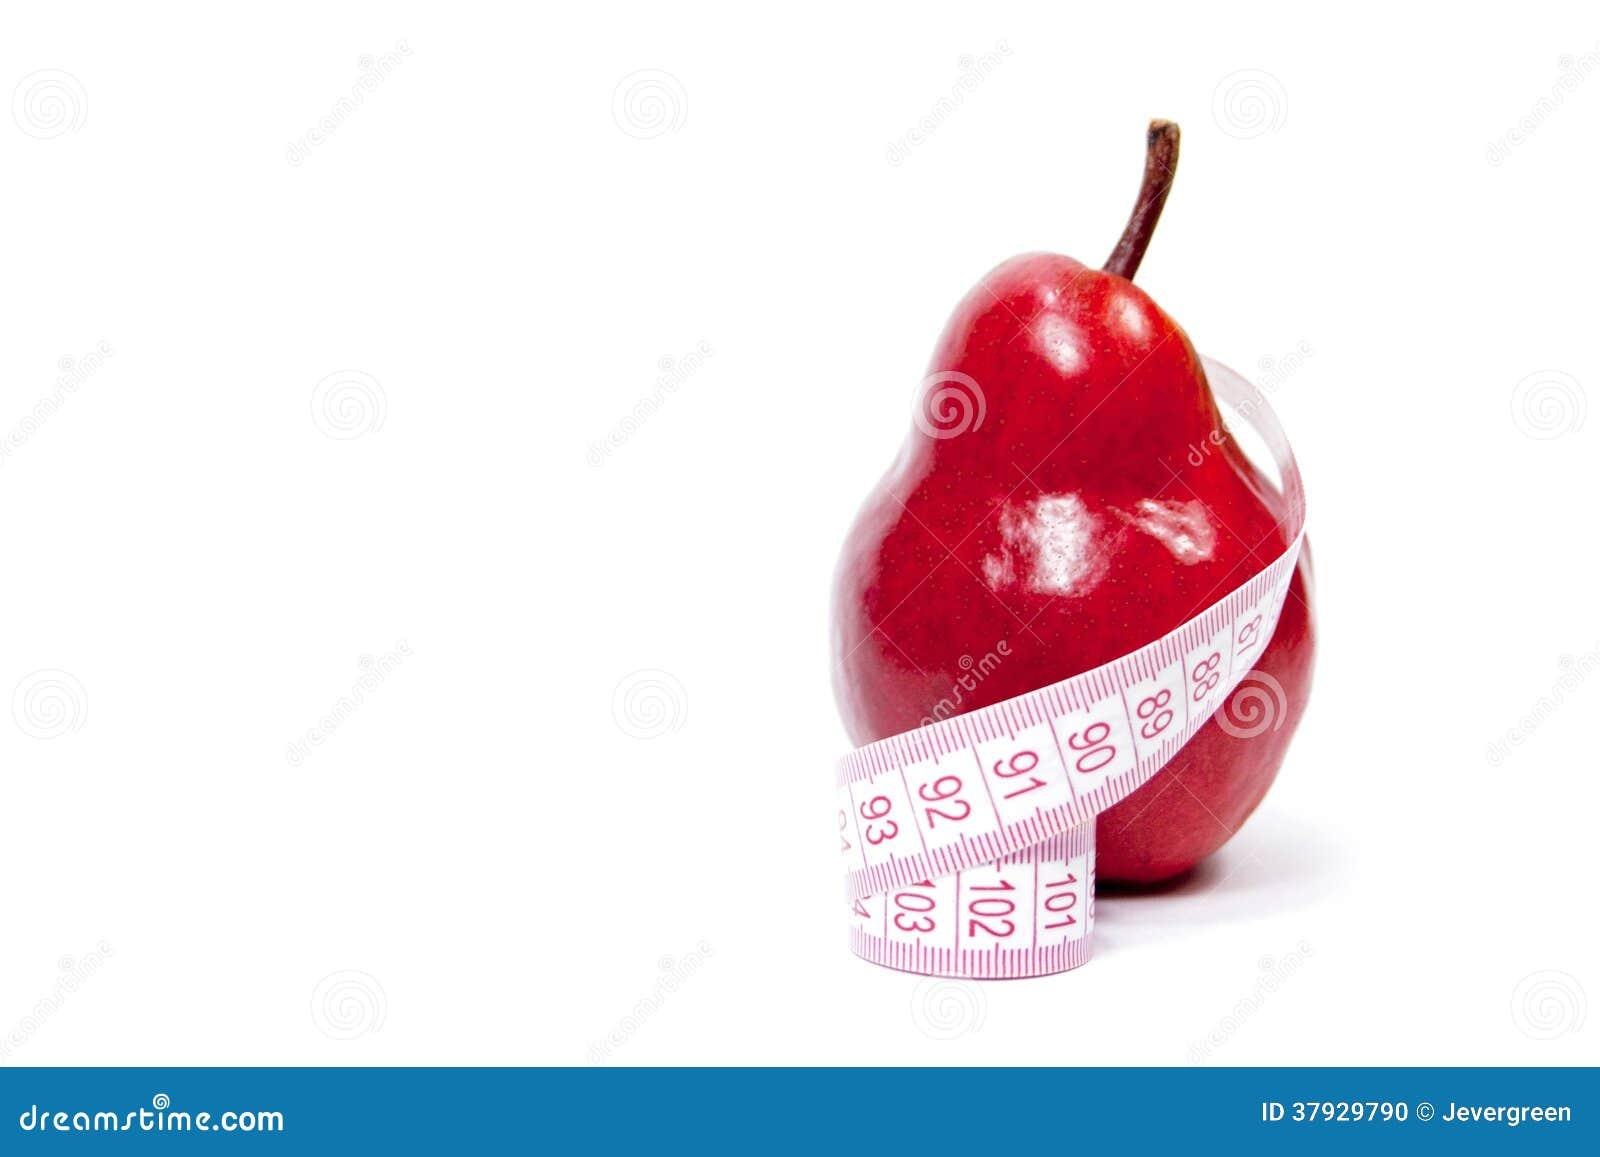 Груша и сантиметр